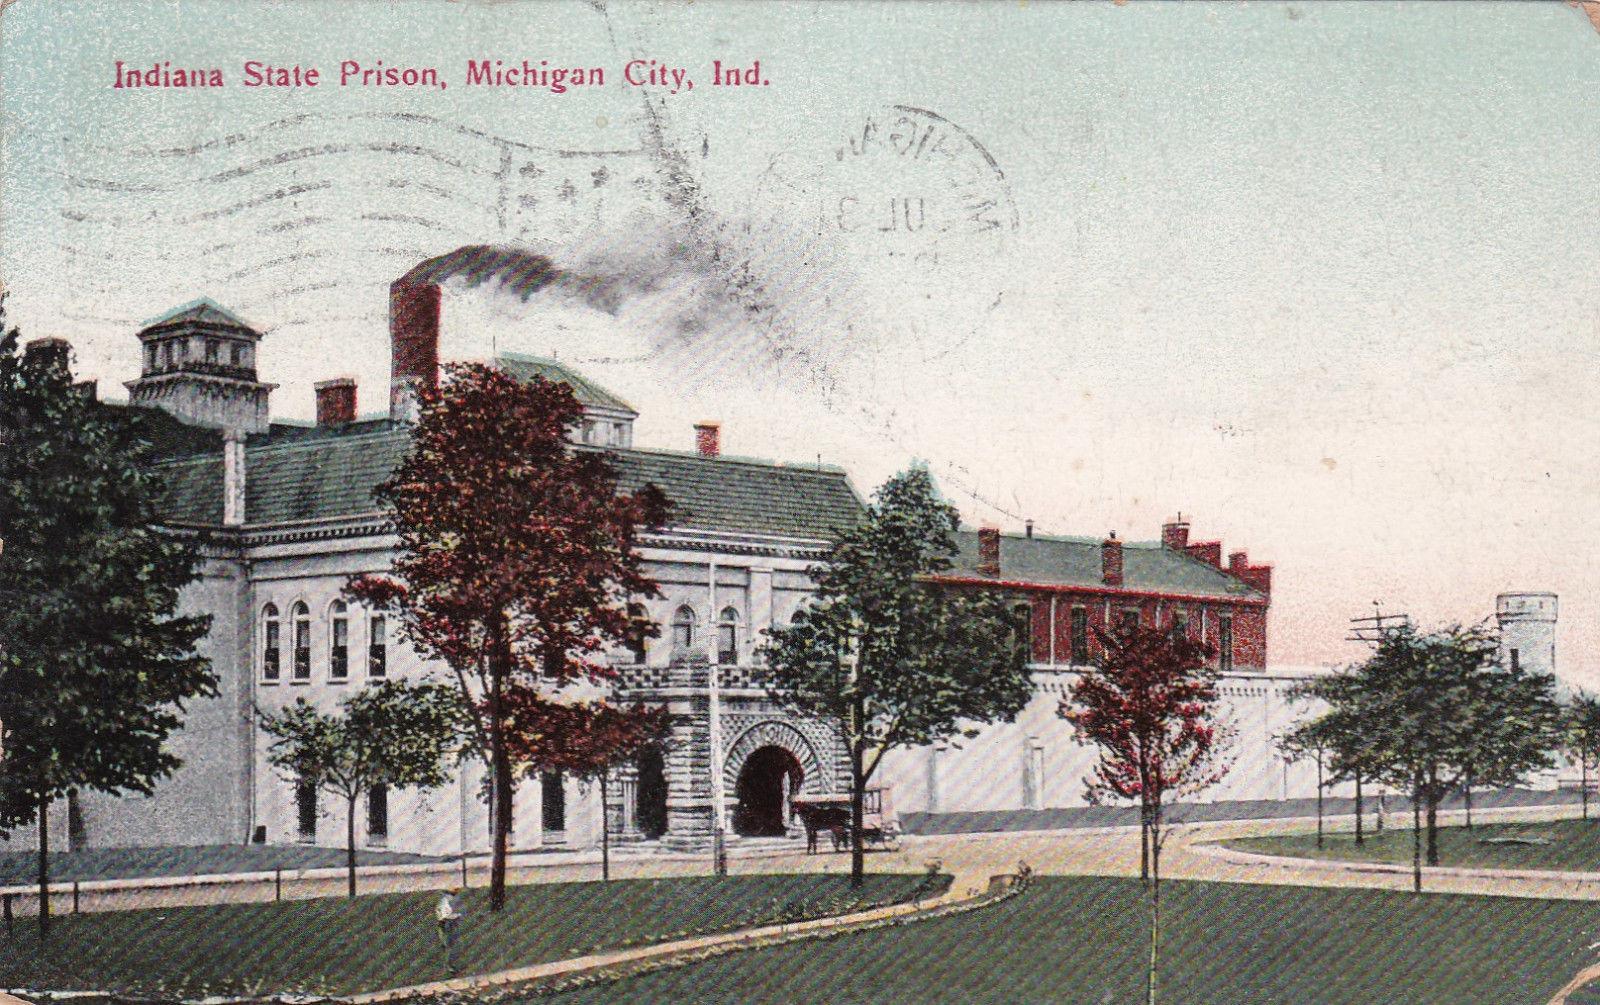 Michigan City Indiana 1900 1910s Indiana State Prison Hippostcard